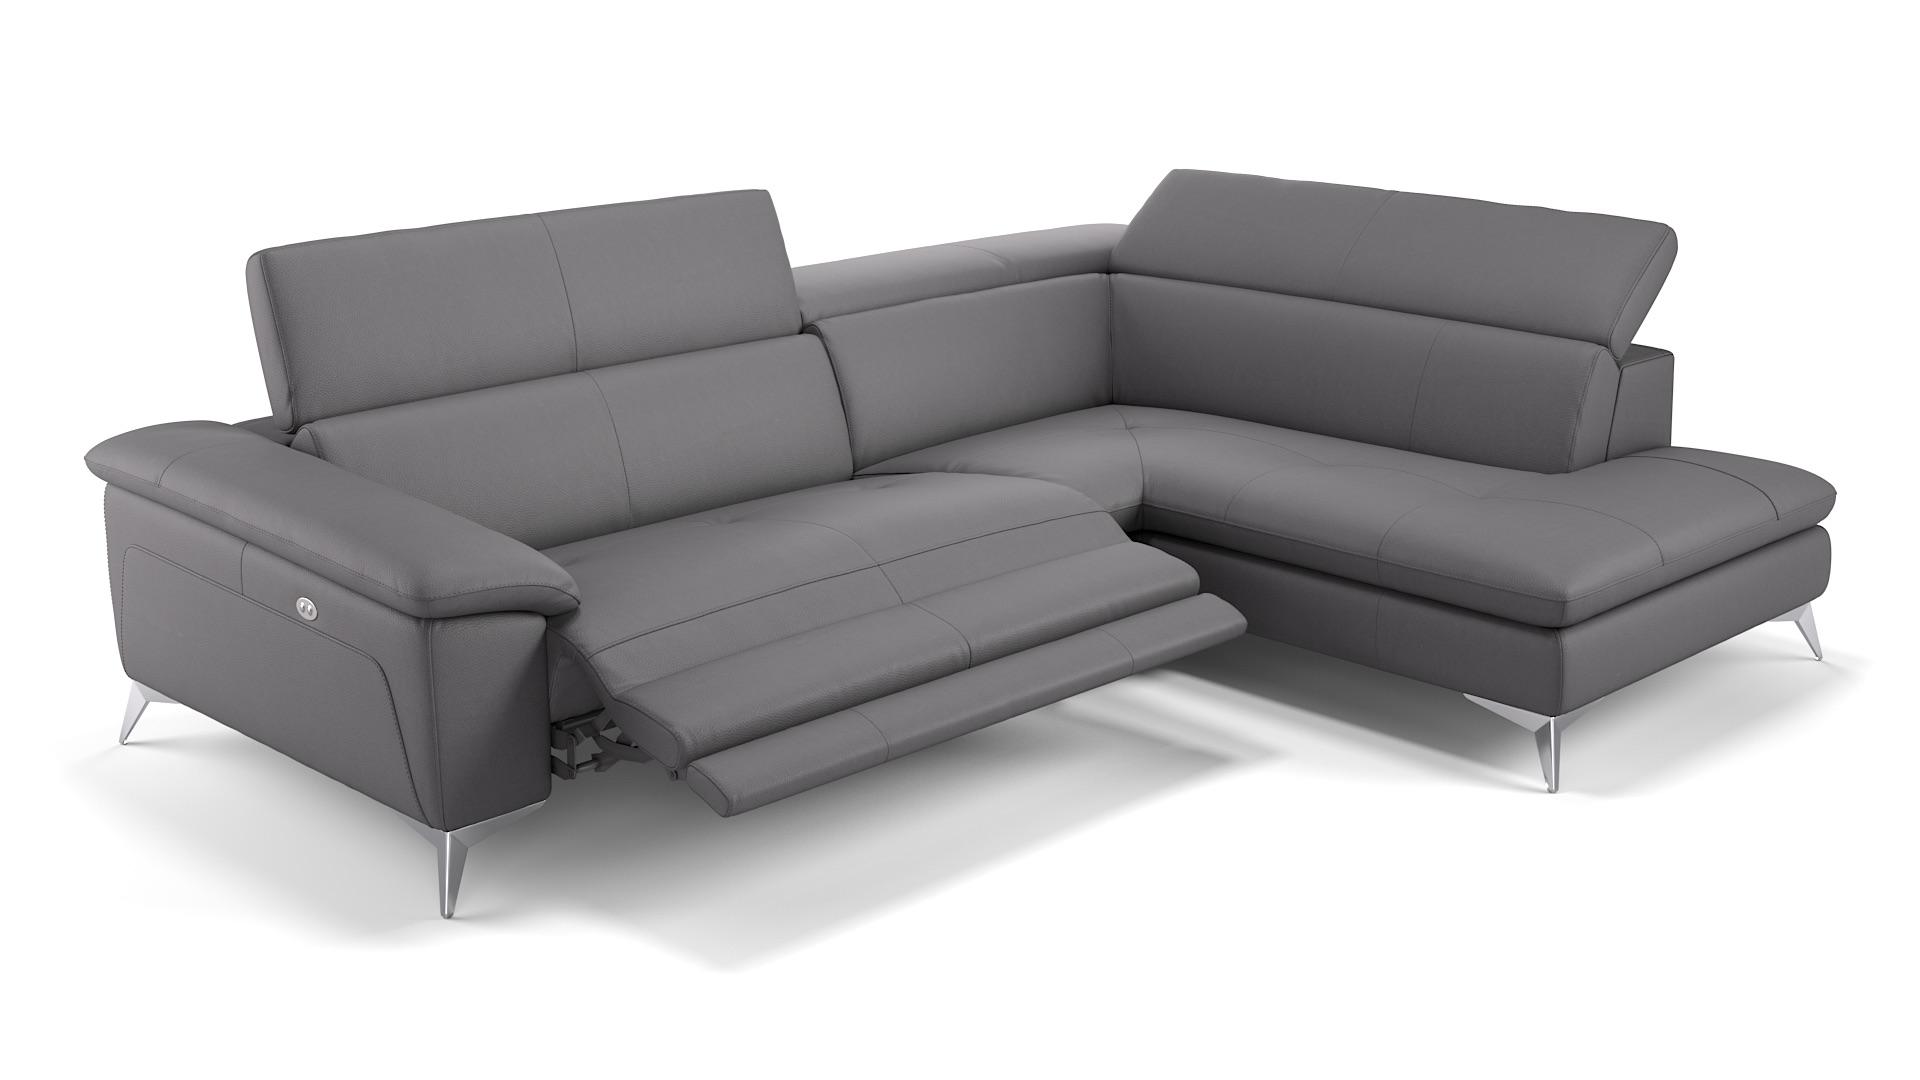 Full Size of Sofa Leder Stella Echtleder Ecksofa Design Couch In Sofanella Schlafsofa Liegefläche 160x200 Angebote Le Corbusier Halbrund Neu Beziehen Lassen 3 Sitzer Sofa Sofa Leder